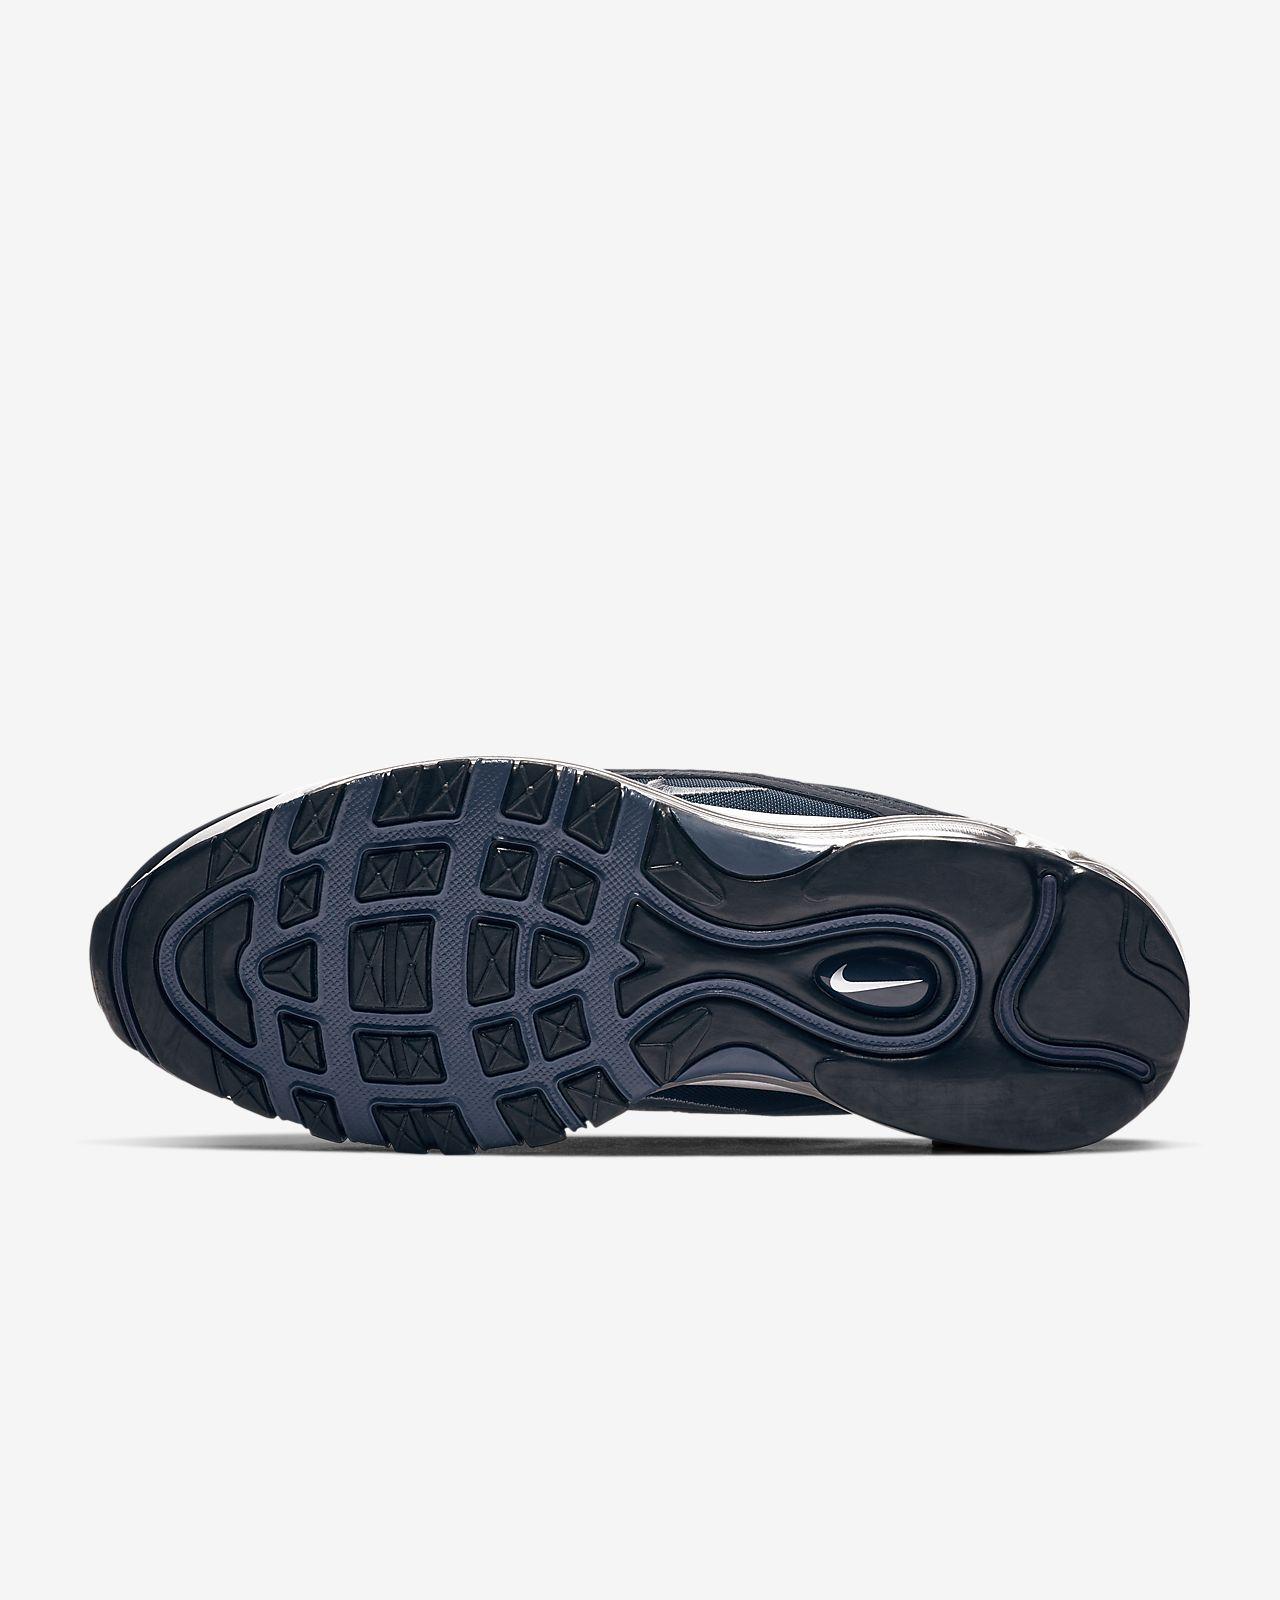 f47cdcfade6 Nike Air Max 97 Essential Herenschoen. Nike.com BE